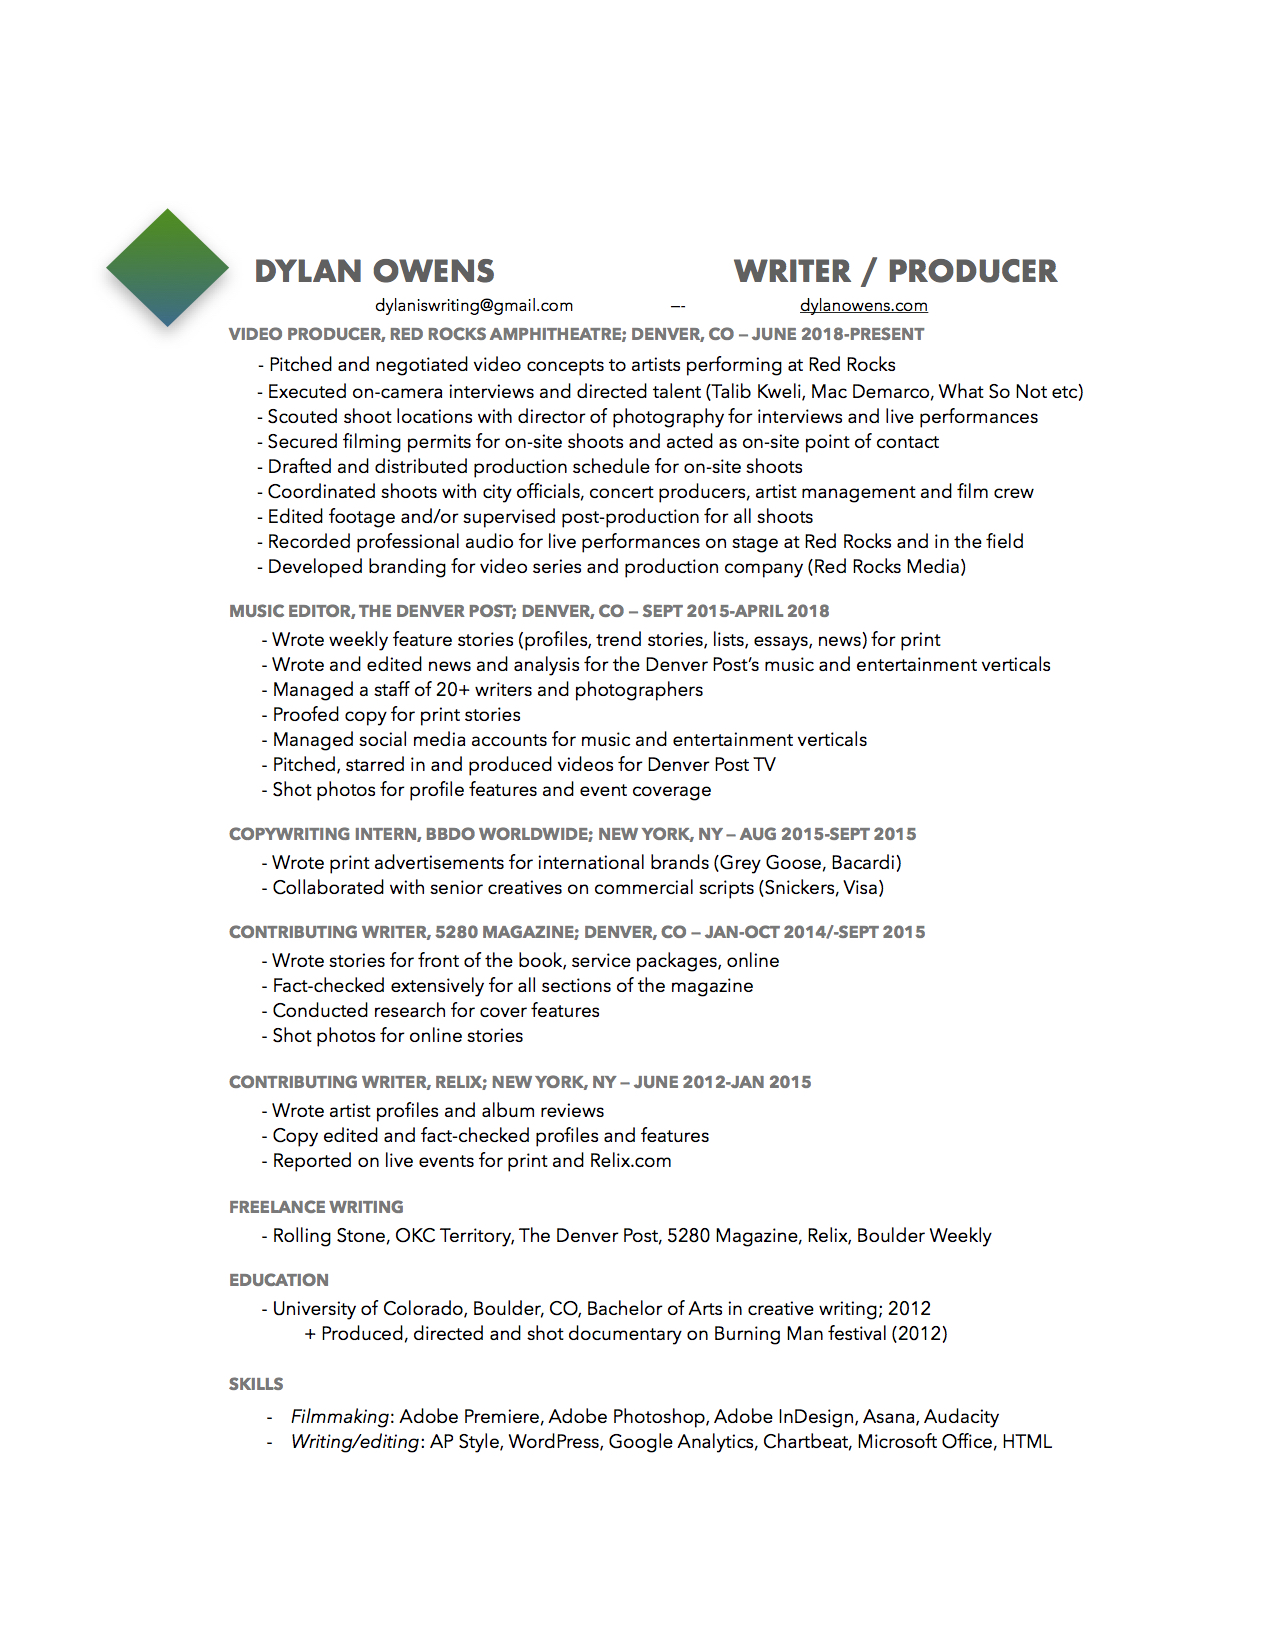 Resume, Oct 2018.jpg